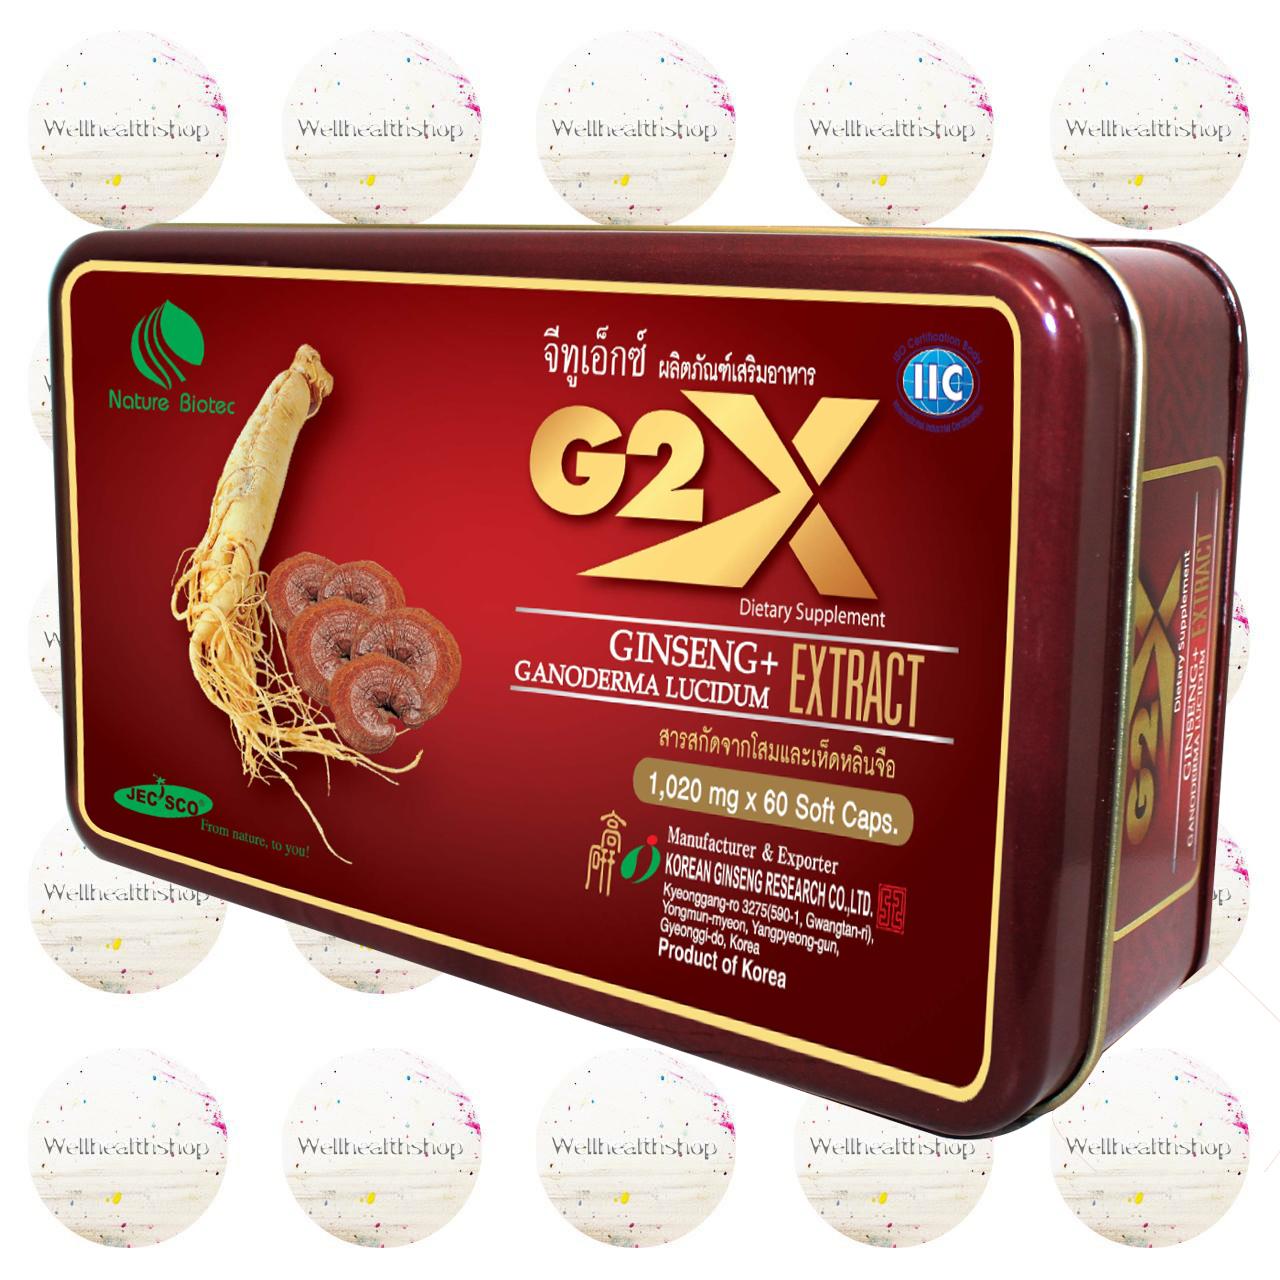 G2X จีทูเอ็กซ์ โสมเกาหลีผสมเห็ดหลินจือ มีวิตามินและแร่ธาตุต่างๆ บำรุงร่างกายและสมอง ส่งฟรีEMS